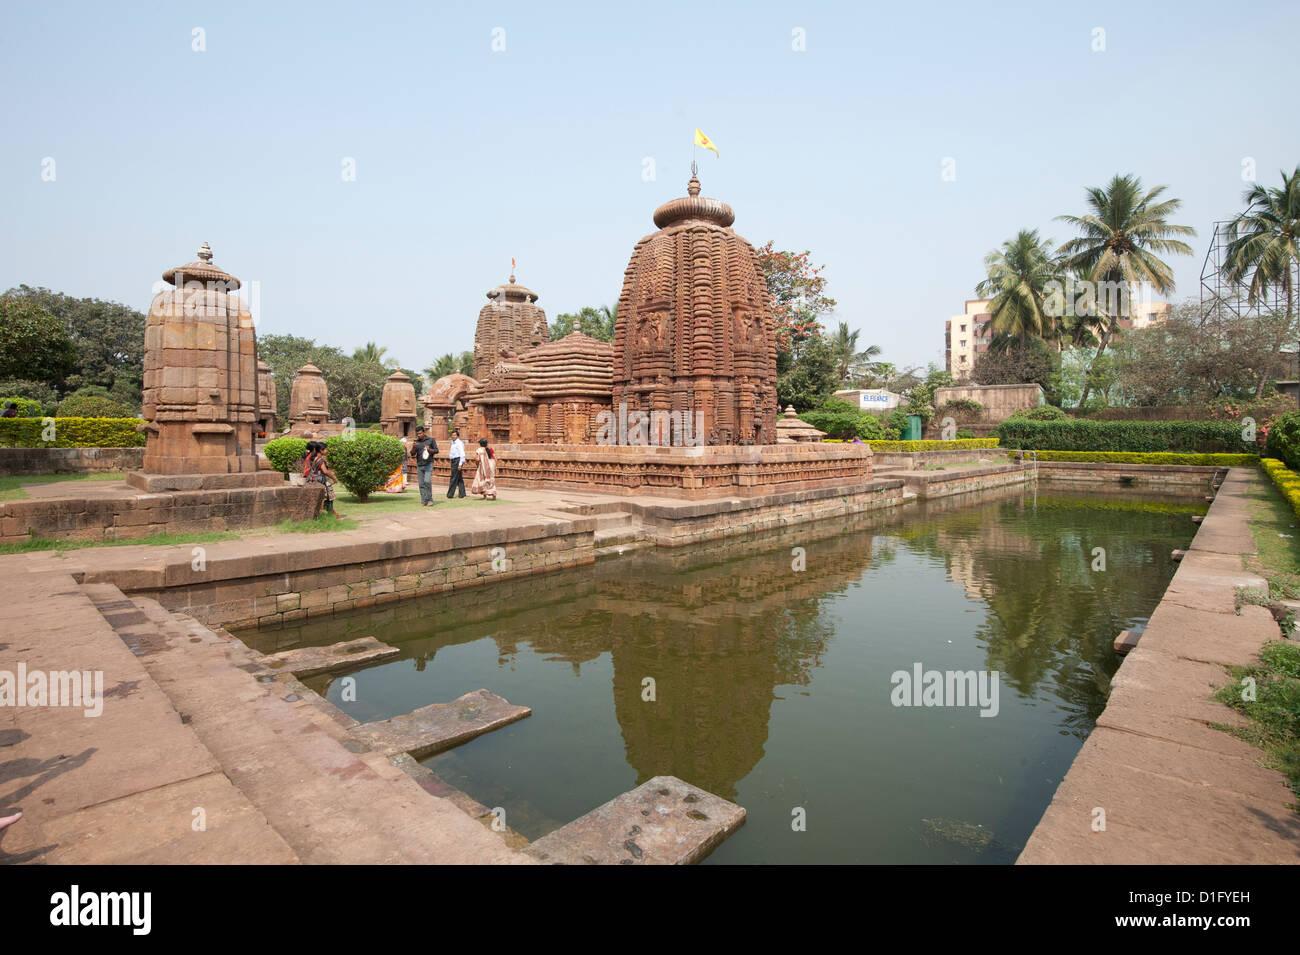 Tank of the 10th century Muktesvara temple complex, early example of Nagara architecture, Bhubaneshwar, Orissa, - Stock Image